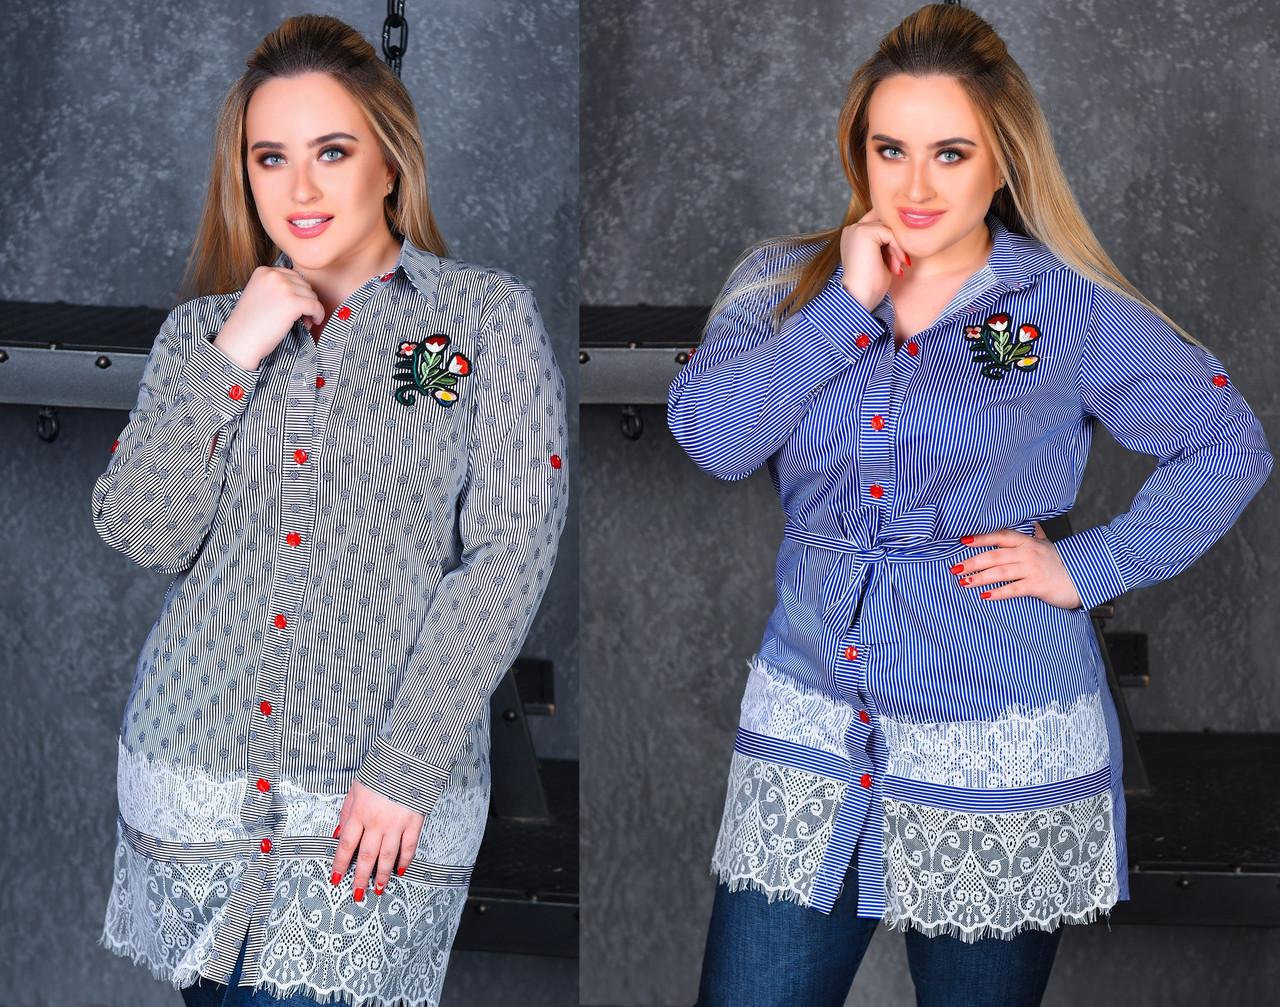 2cee871a303c Женская рубашка - туника большого размера